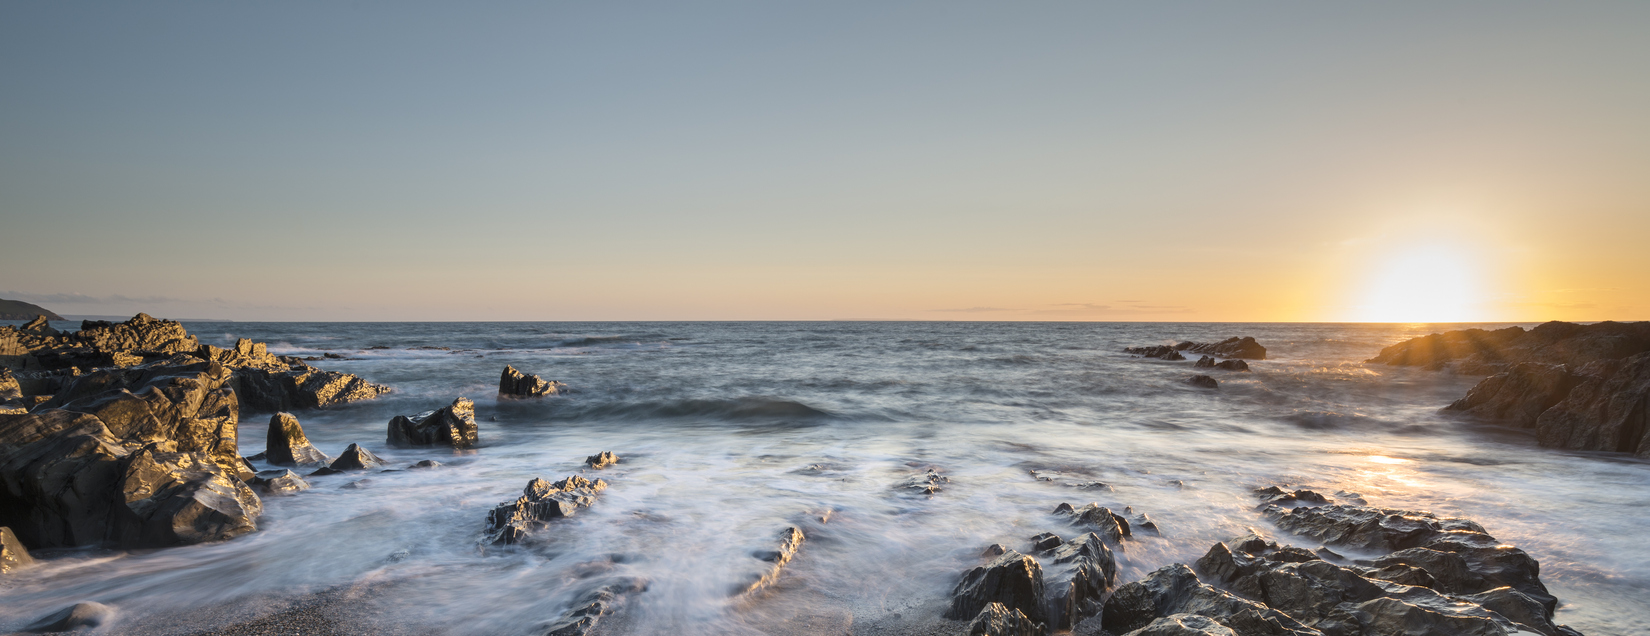 Panorama sunset landscape of Woolacombe beach in Devon England